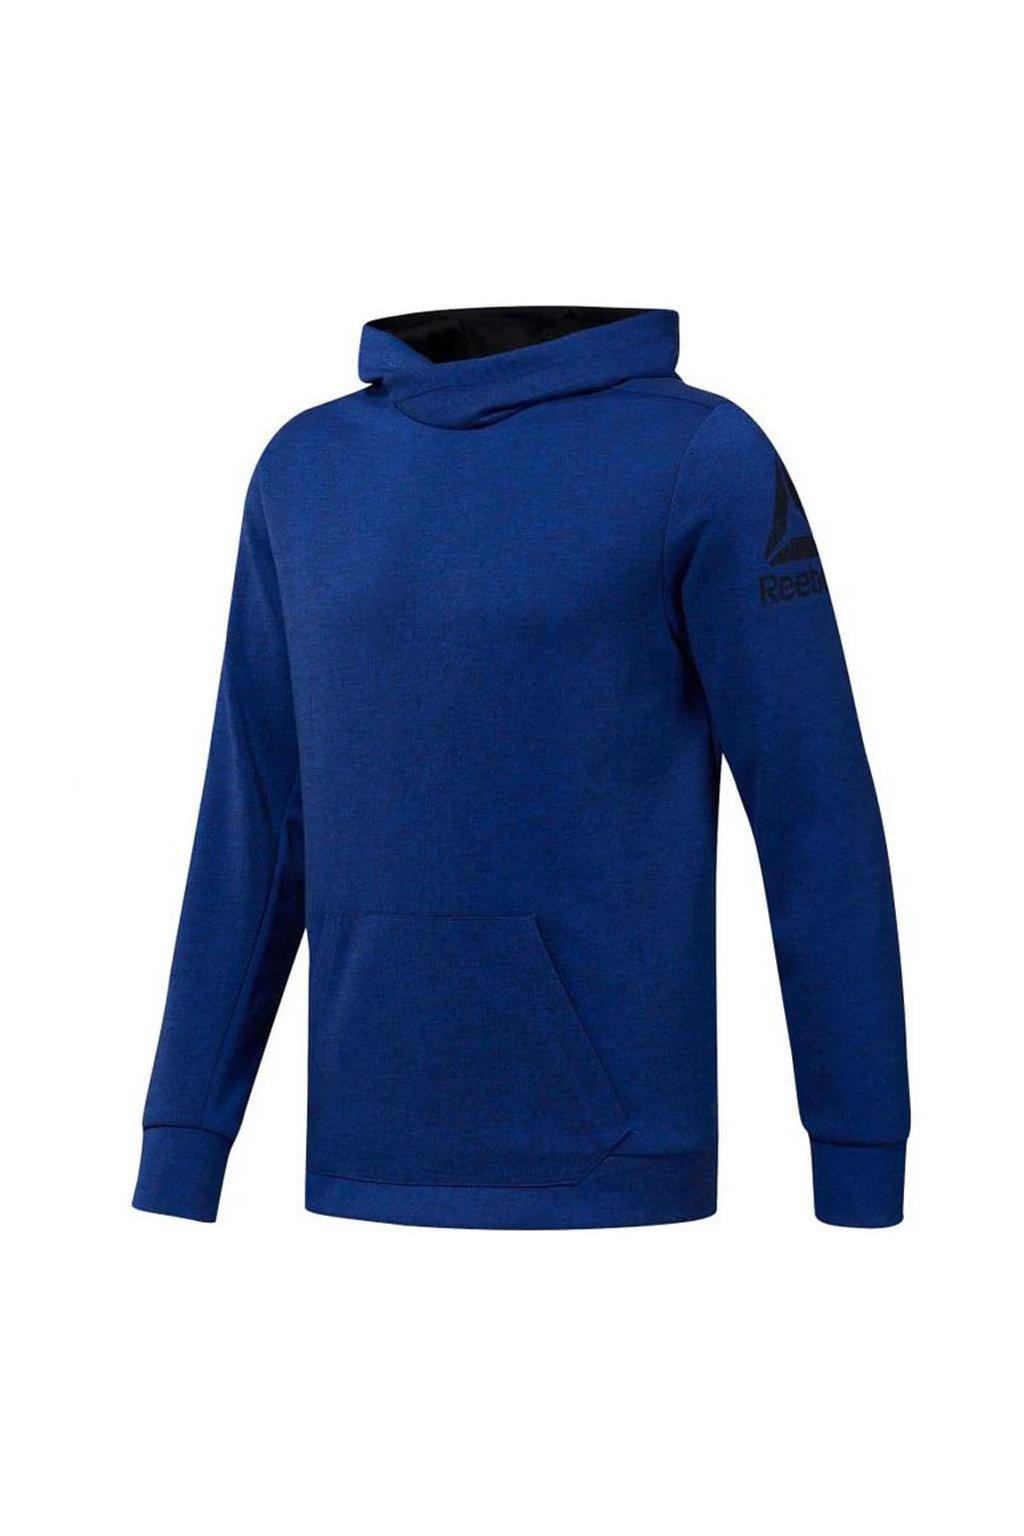 Pánska mikina Reebok Workout Doubleknit Hoodie tmavo modrá DU2156